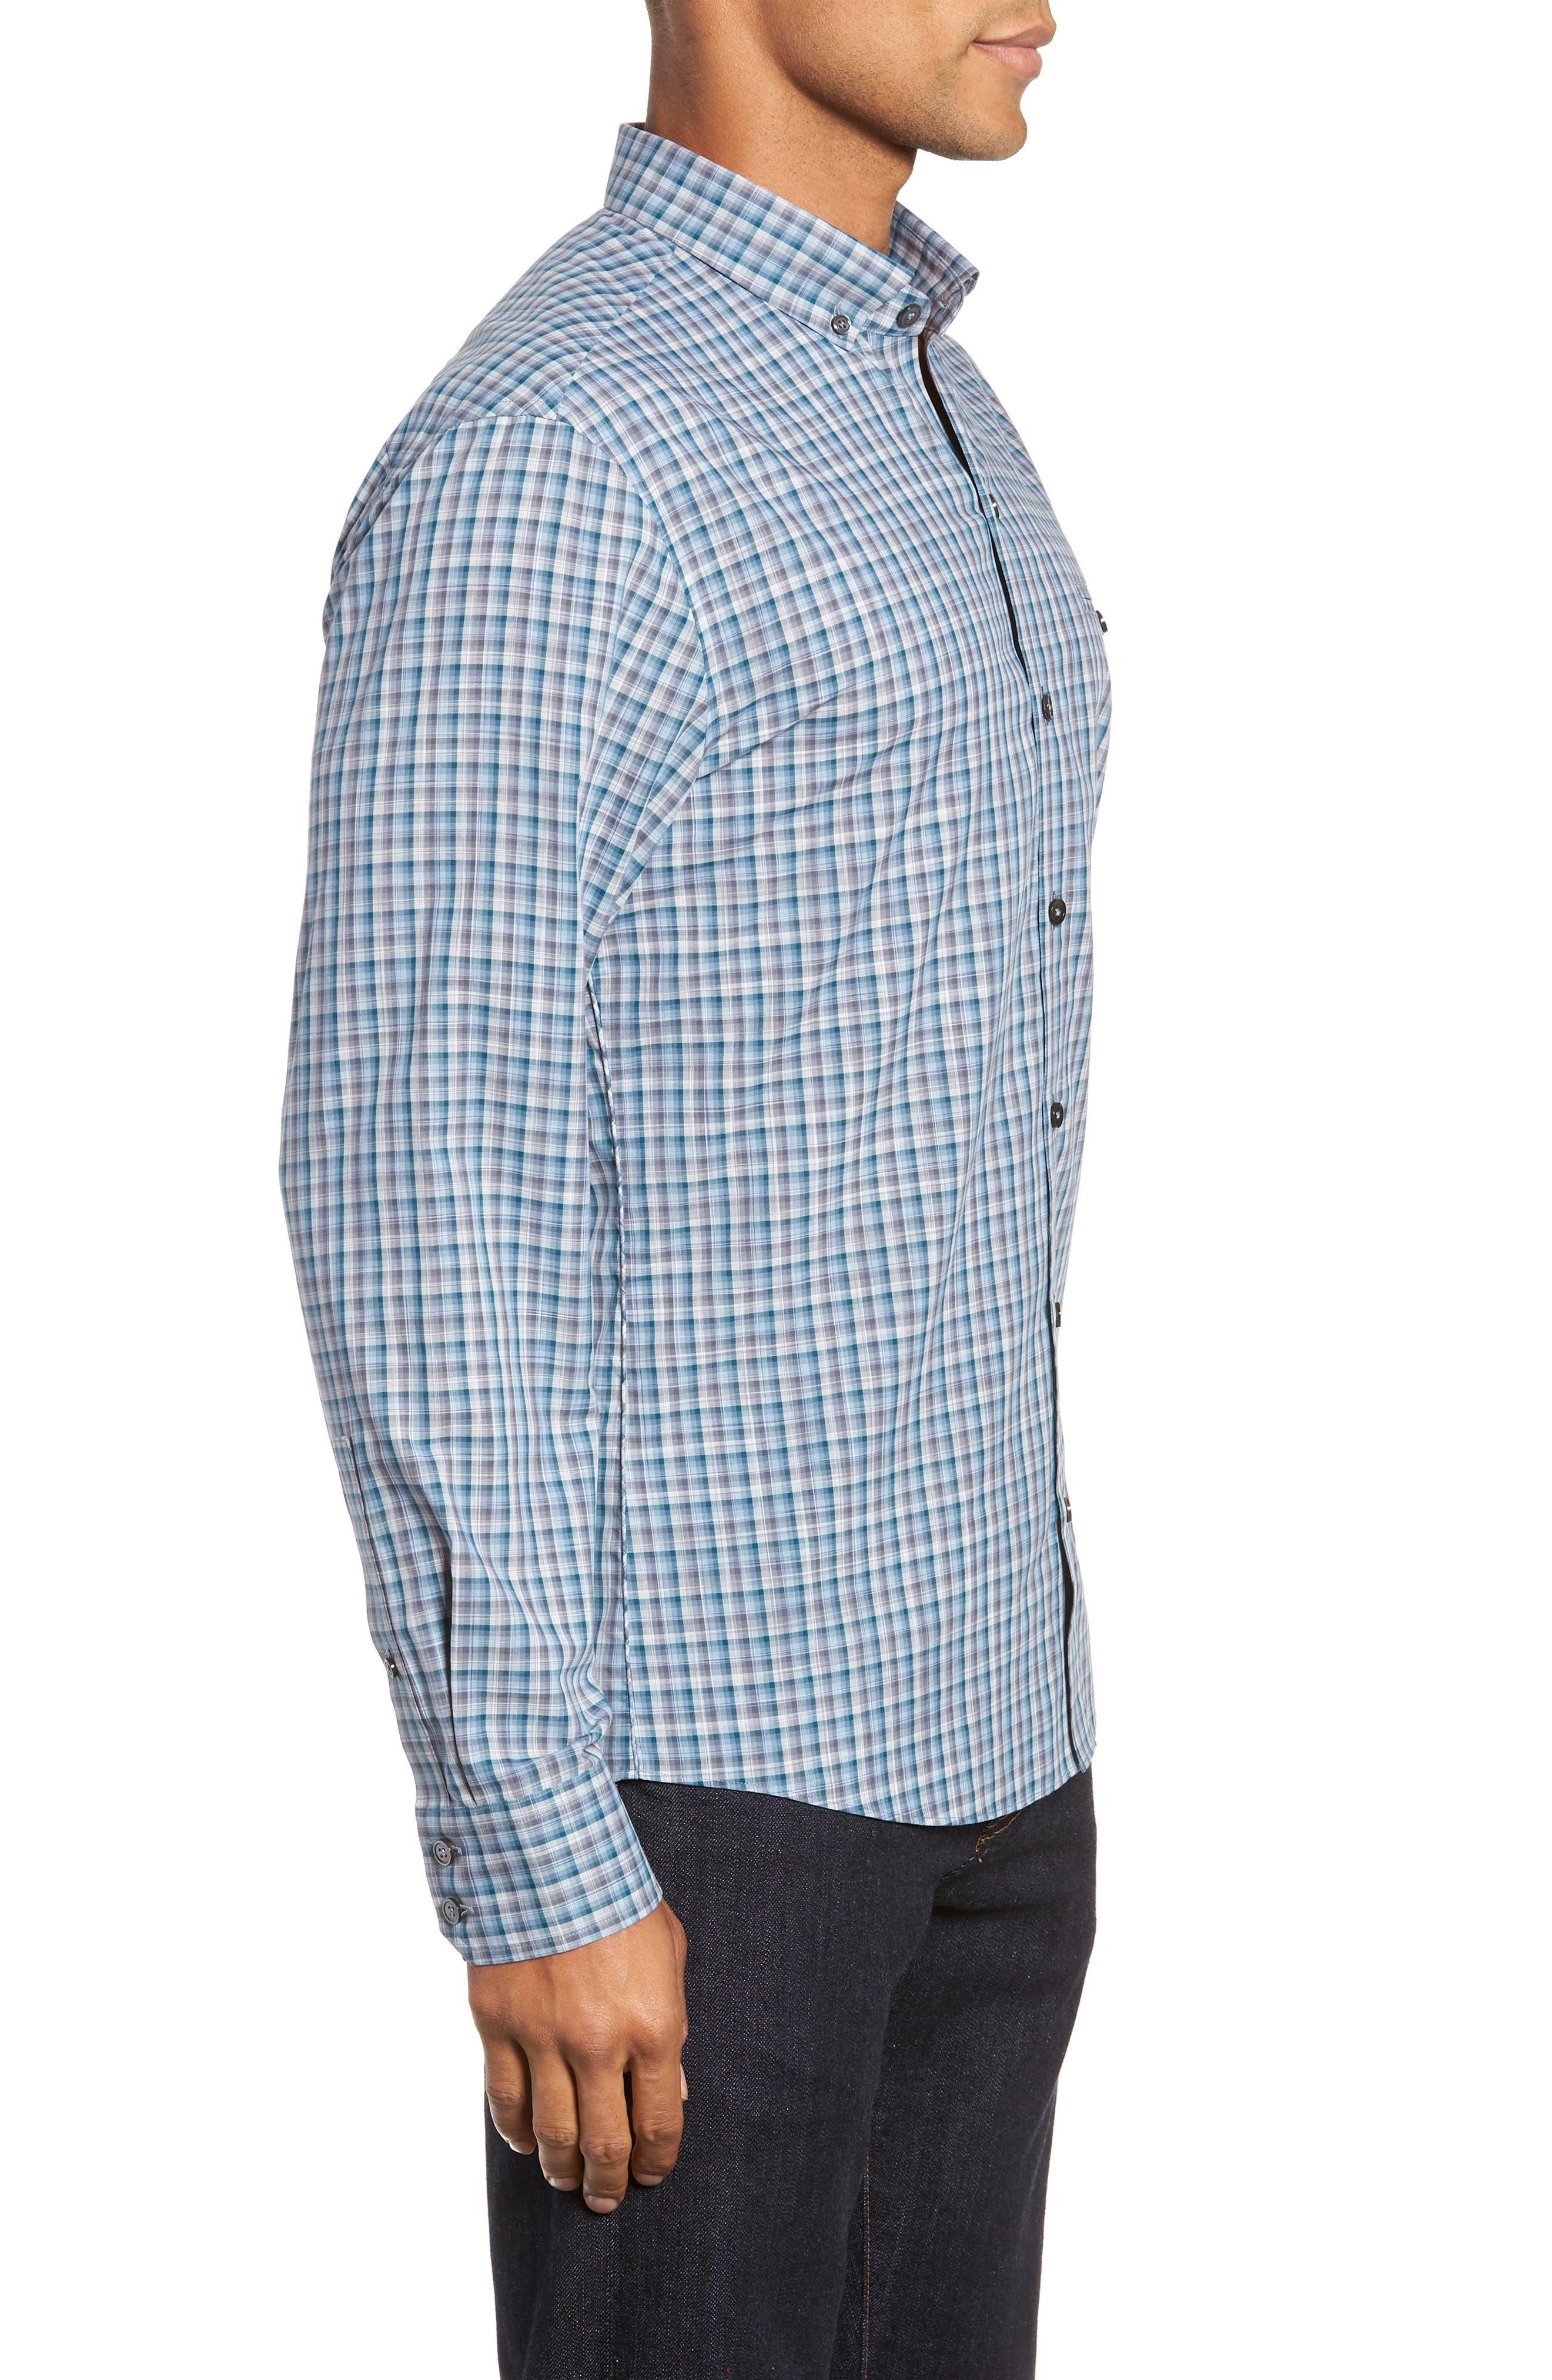 ZACHARY PRELL, Godinez Regular Fit Check Sport Shirt, Alternate thumbnail 4, color, 475